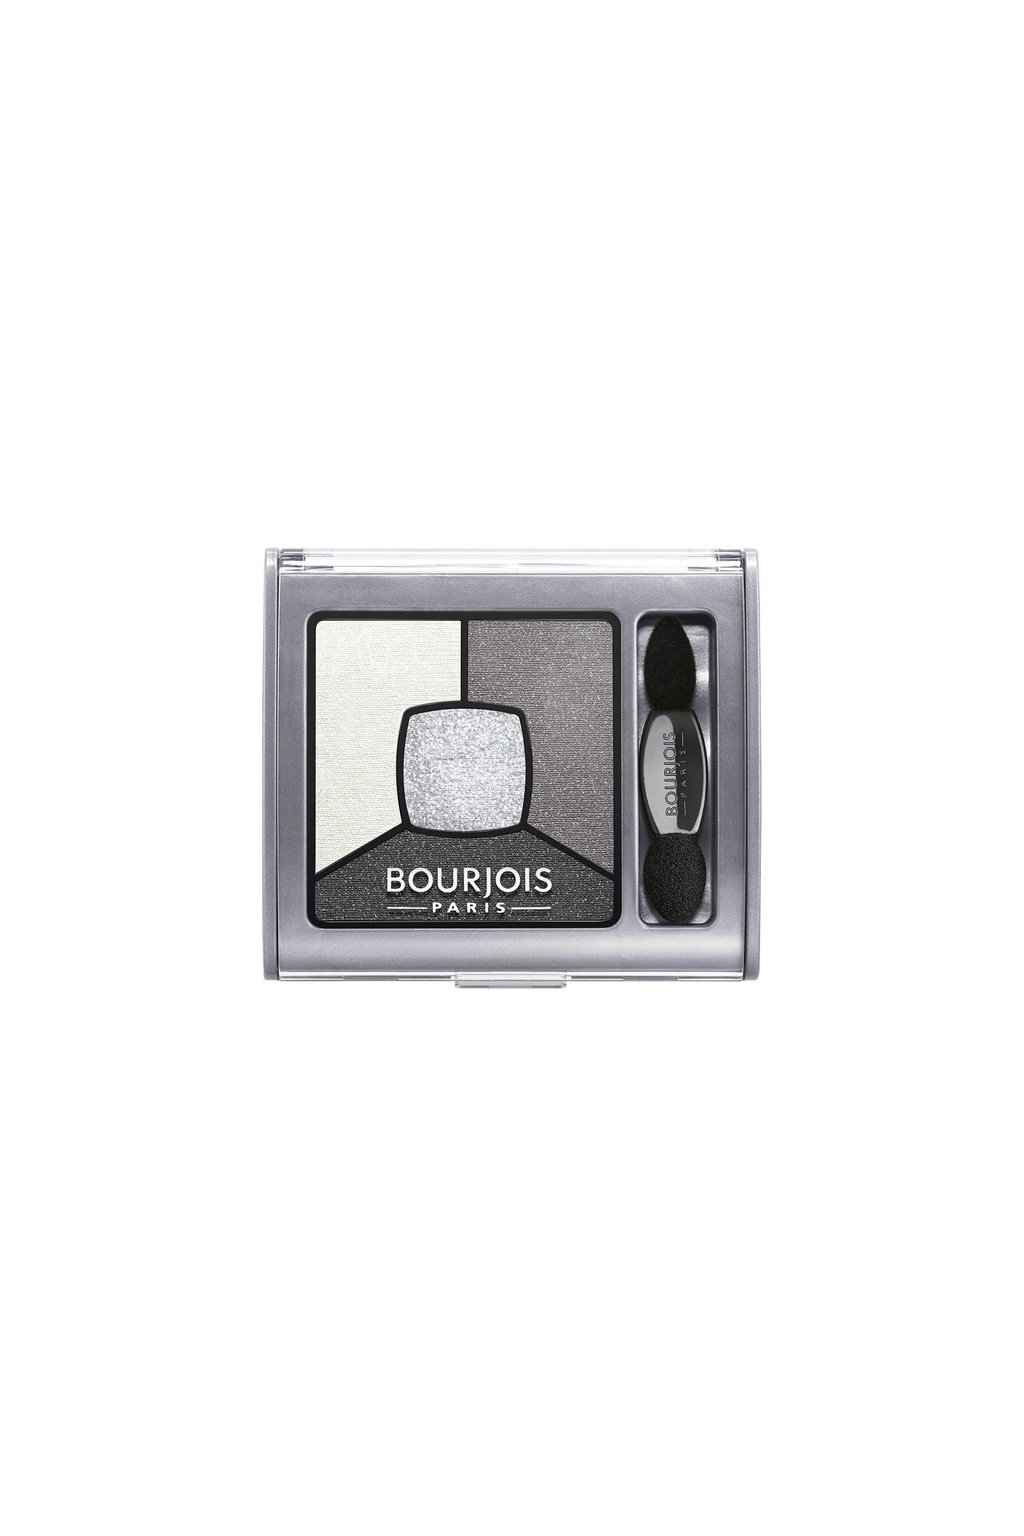 Bourjois Smoky Stories Quad Eyeshadow Palette (Odstín 01 Grey Night 3,2 g)